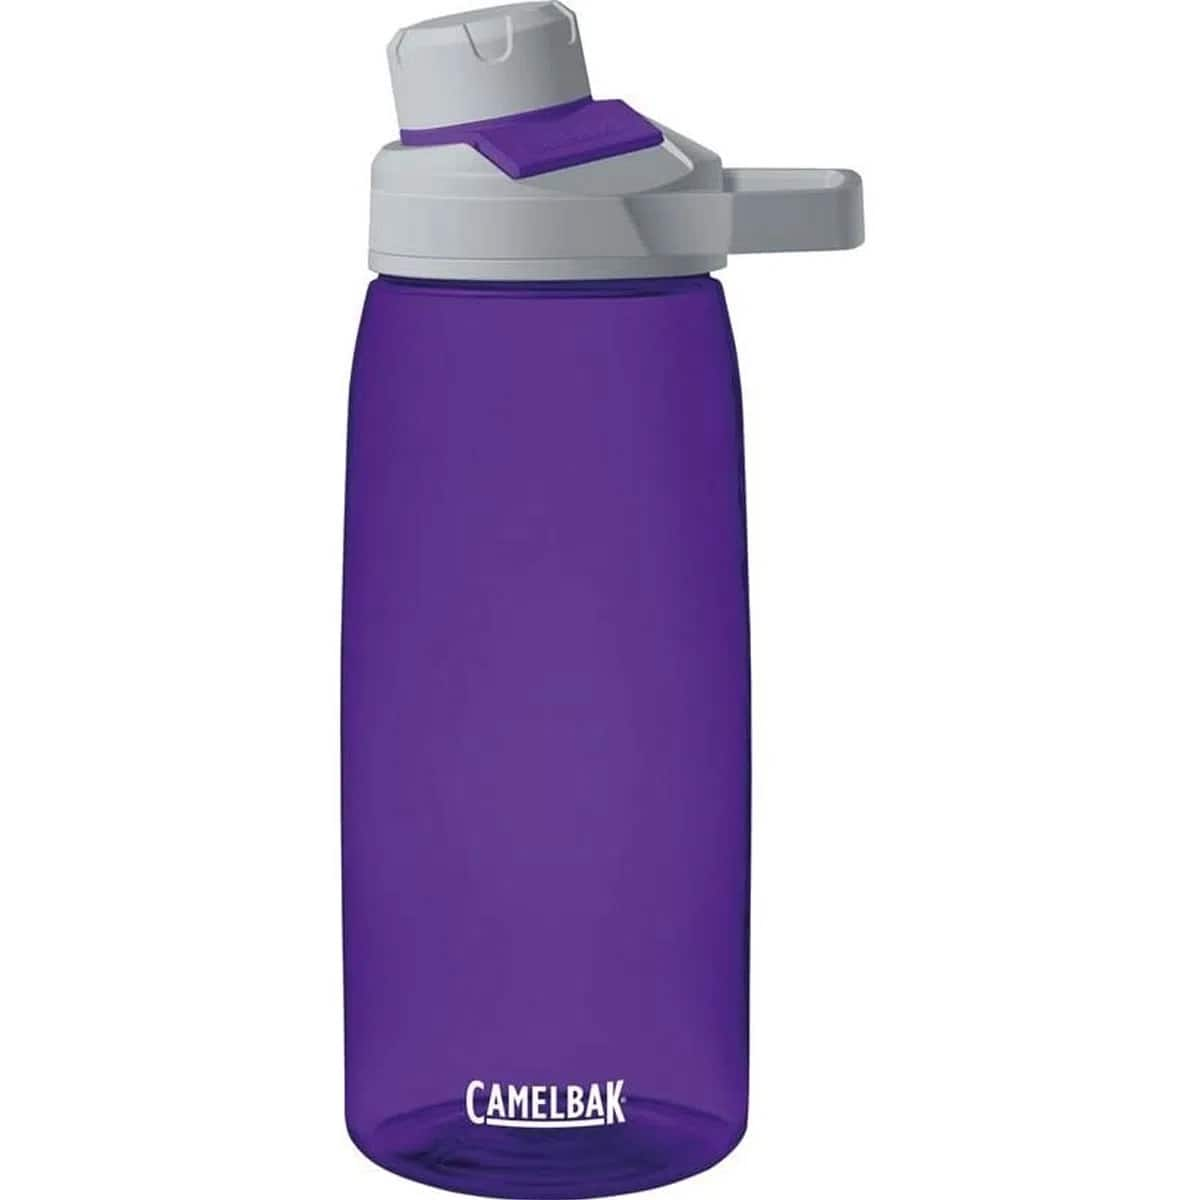 Camelbak Chute Waterbottle $2.99